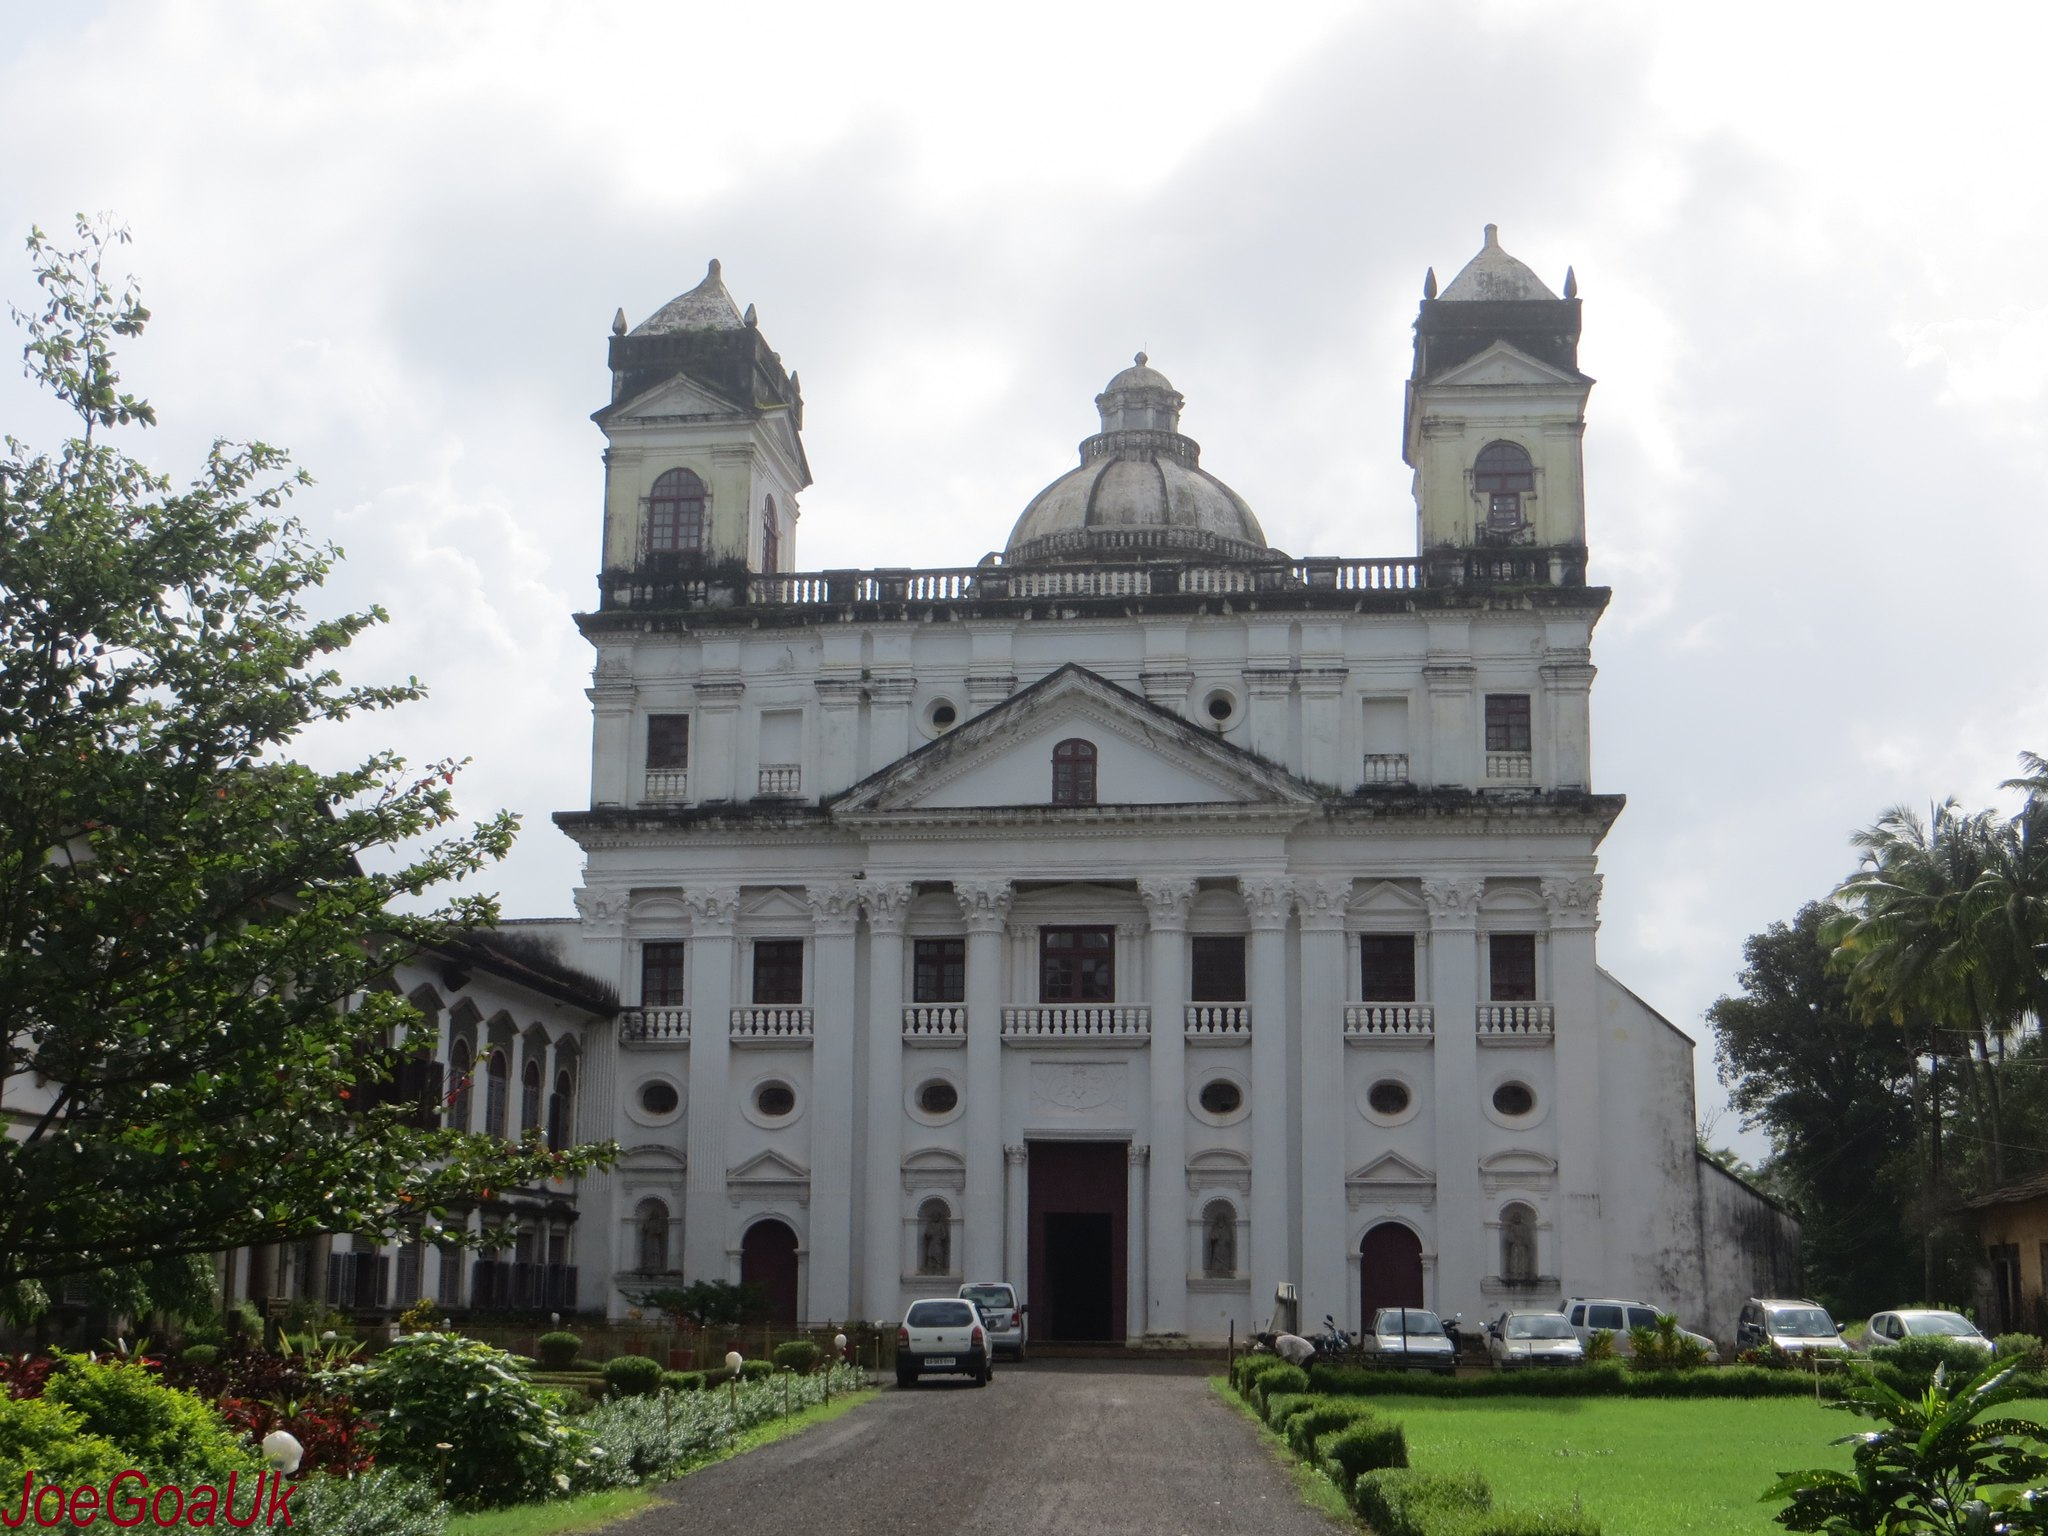 Church of St. Cajetan - Popular Churches That You Must Visit in Goa